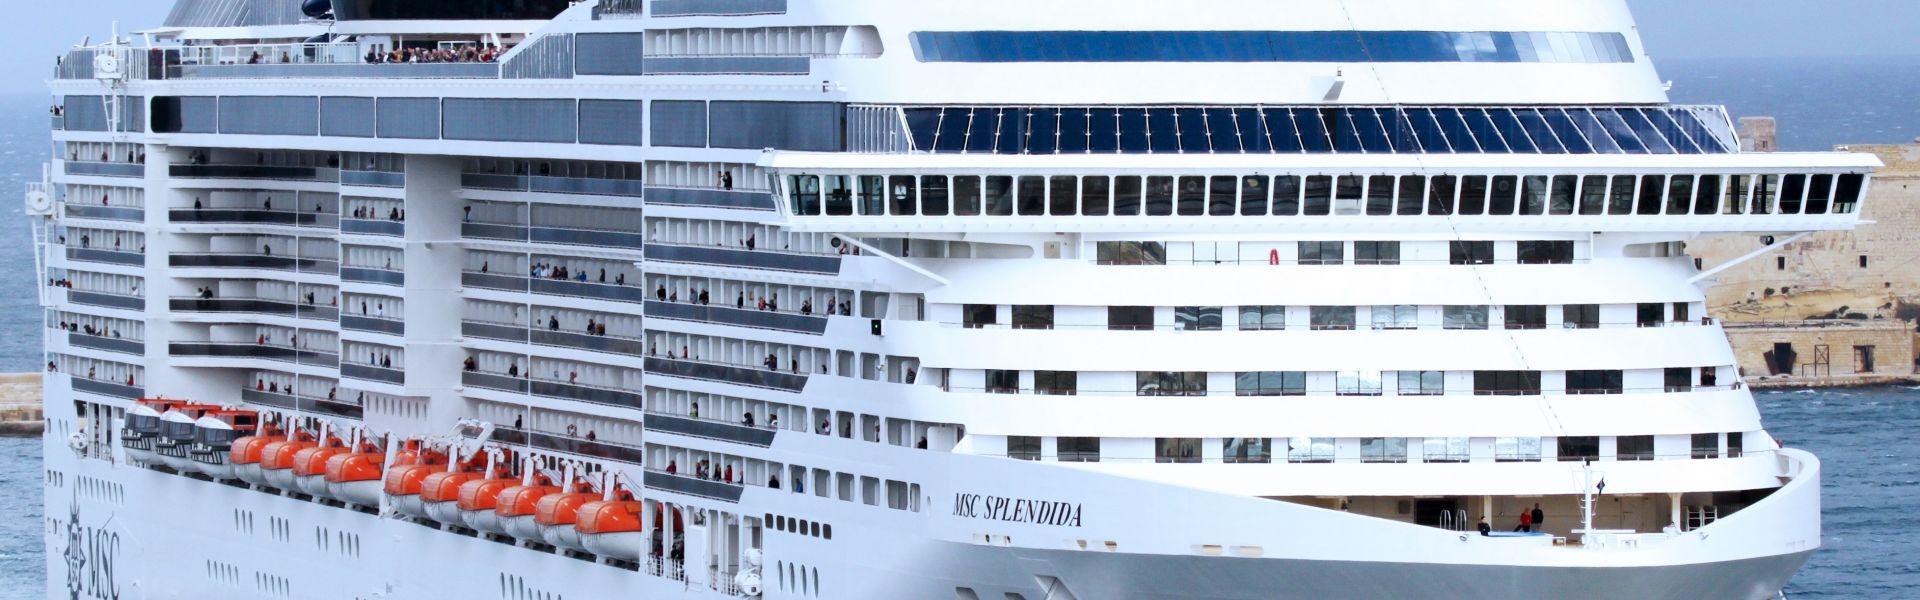 Croaziera 2018/2019 - Orientul Mijlociu (Dubai) - MSC Cruises - MSC Splendida - 7 nopti